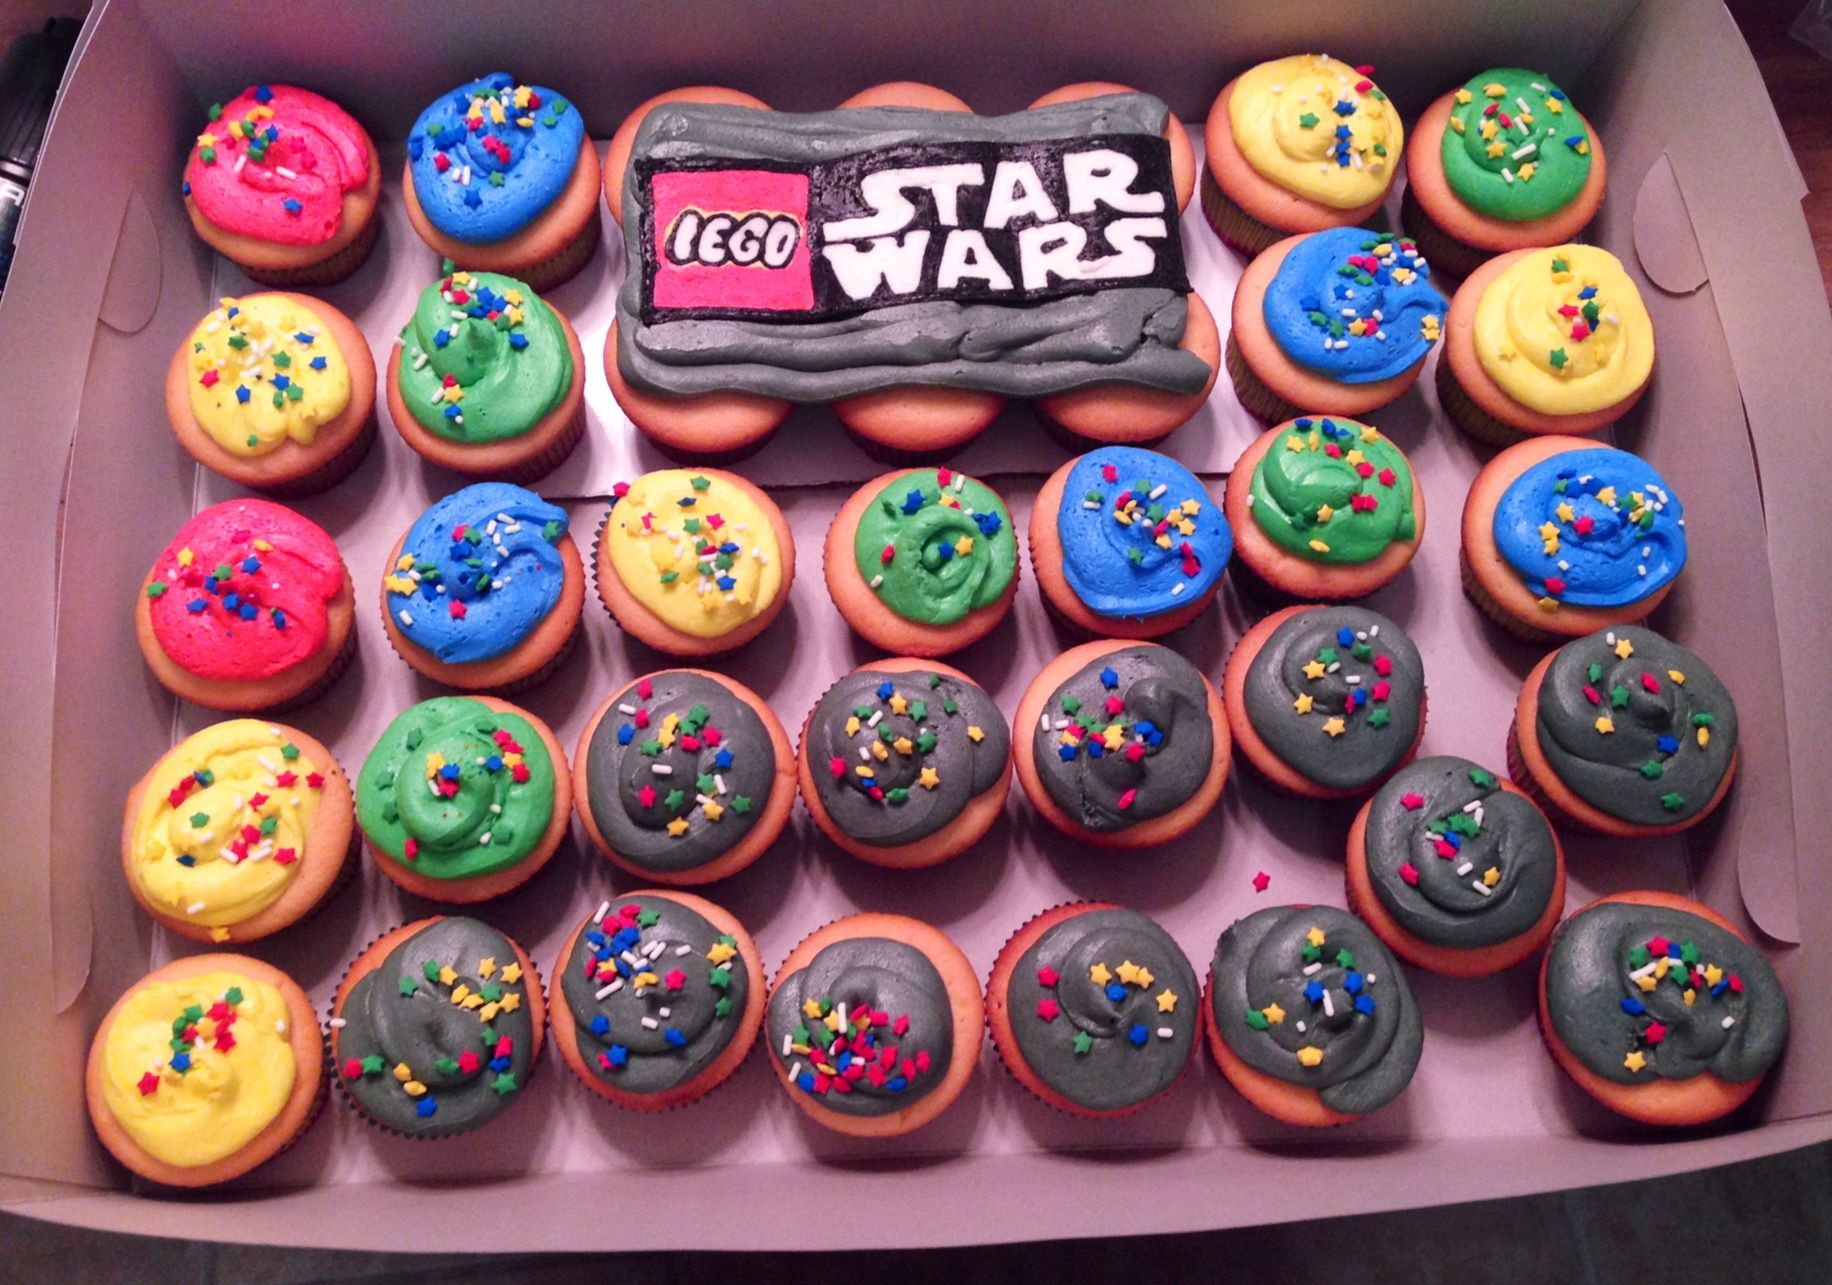 Lego Star Wars Cupcakes